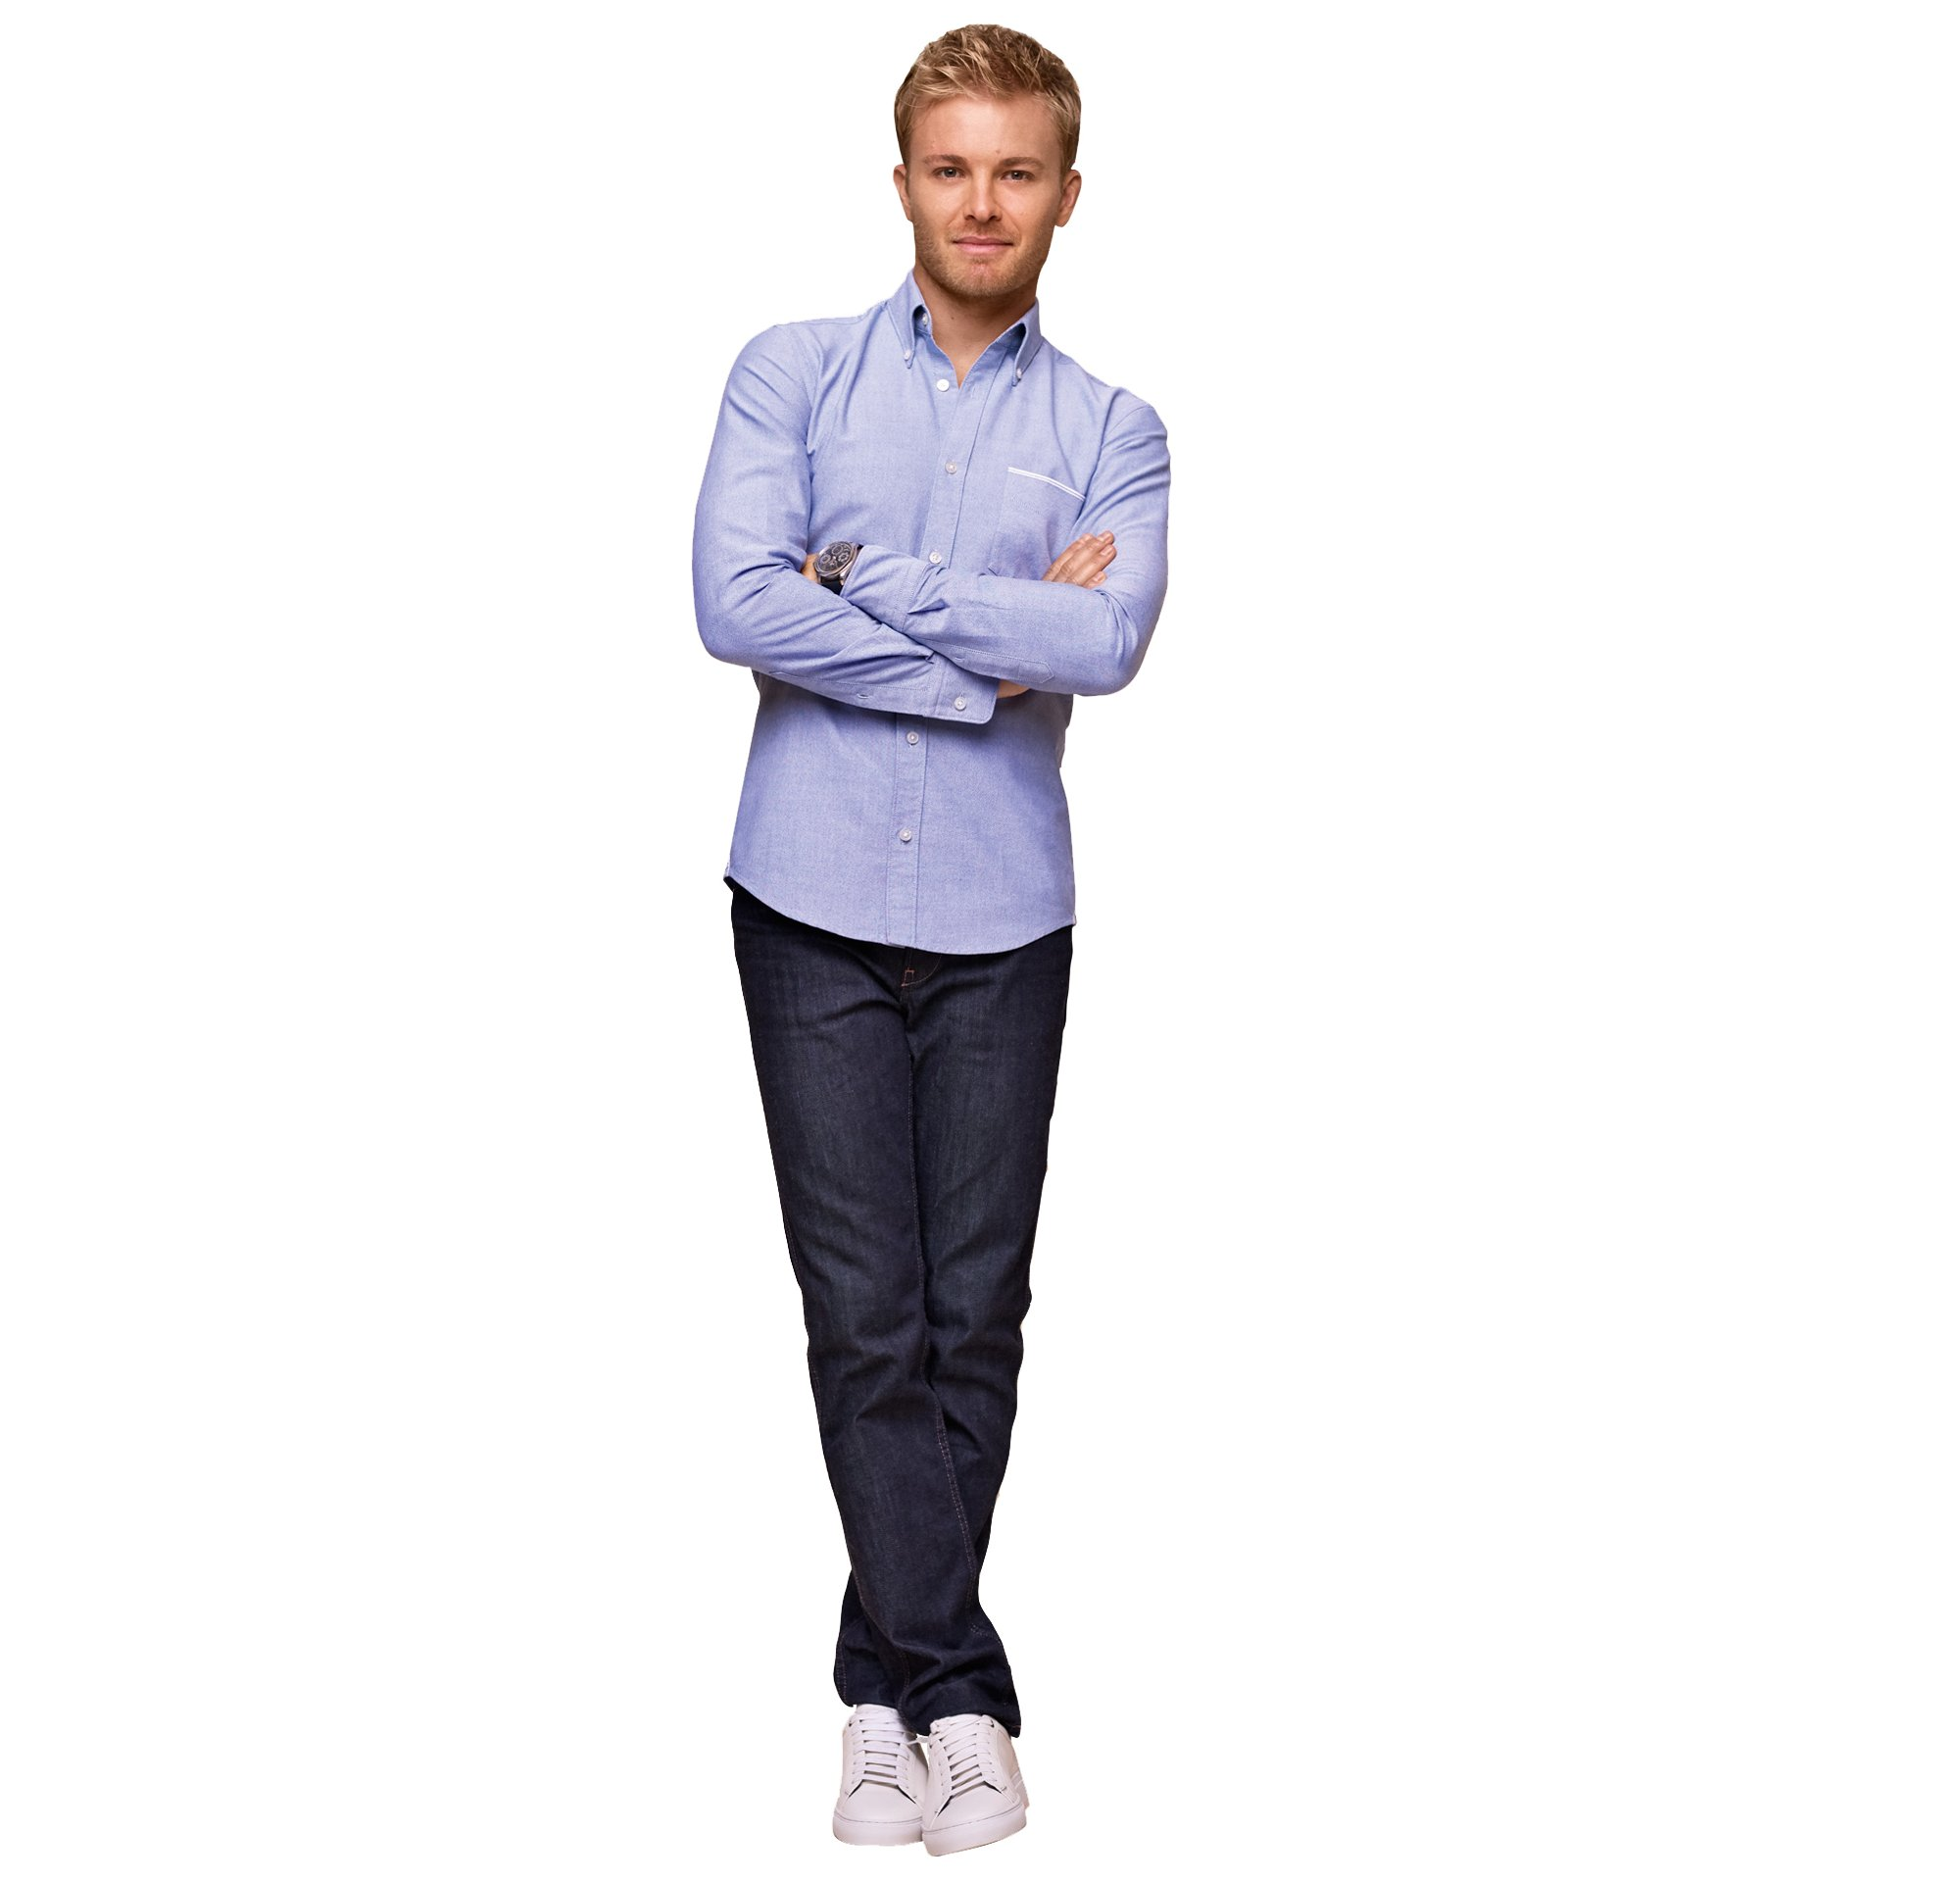 BOSS_Wardrobe _Staples_Rosberg_Look_1